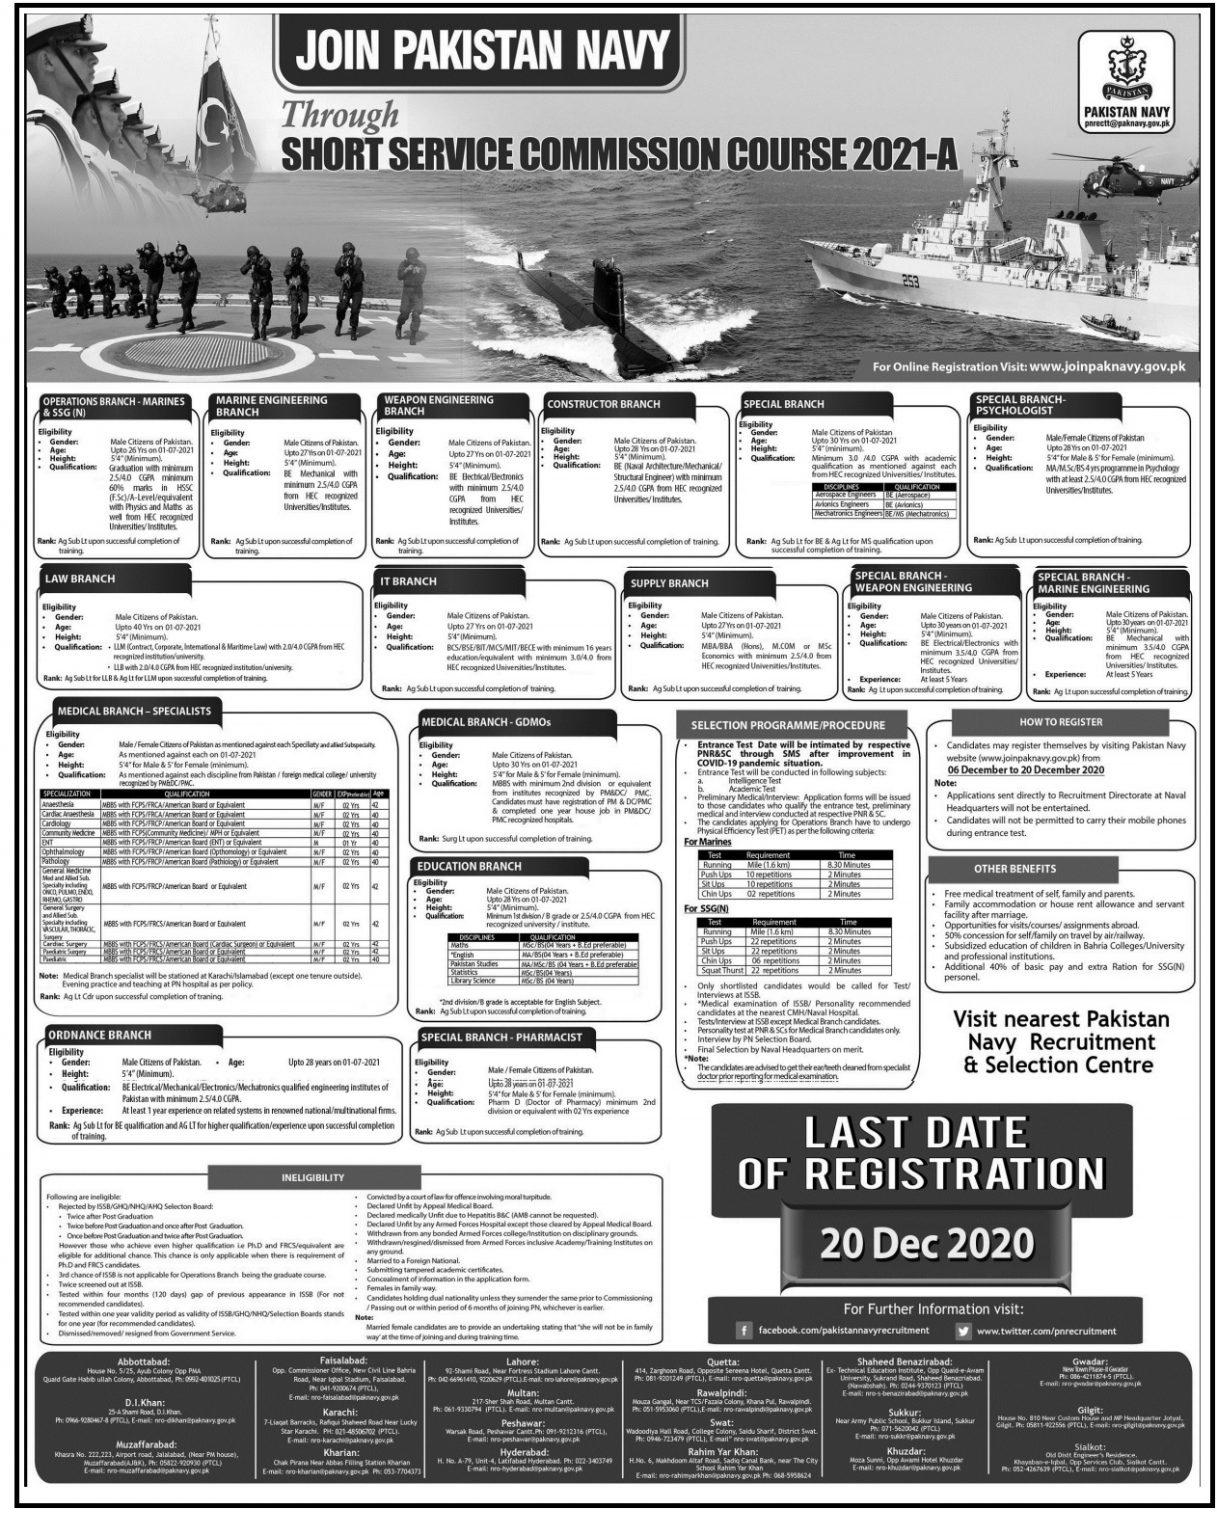 Pak Navy Jobs 2020 Online Registration Through Short Service Commission Course 2021-A